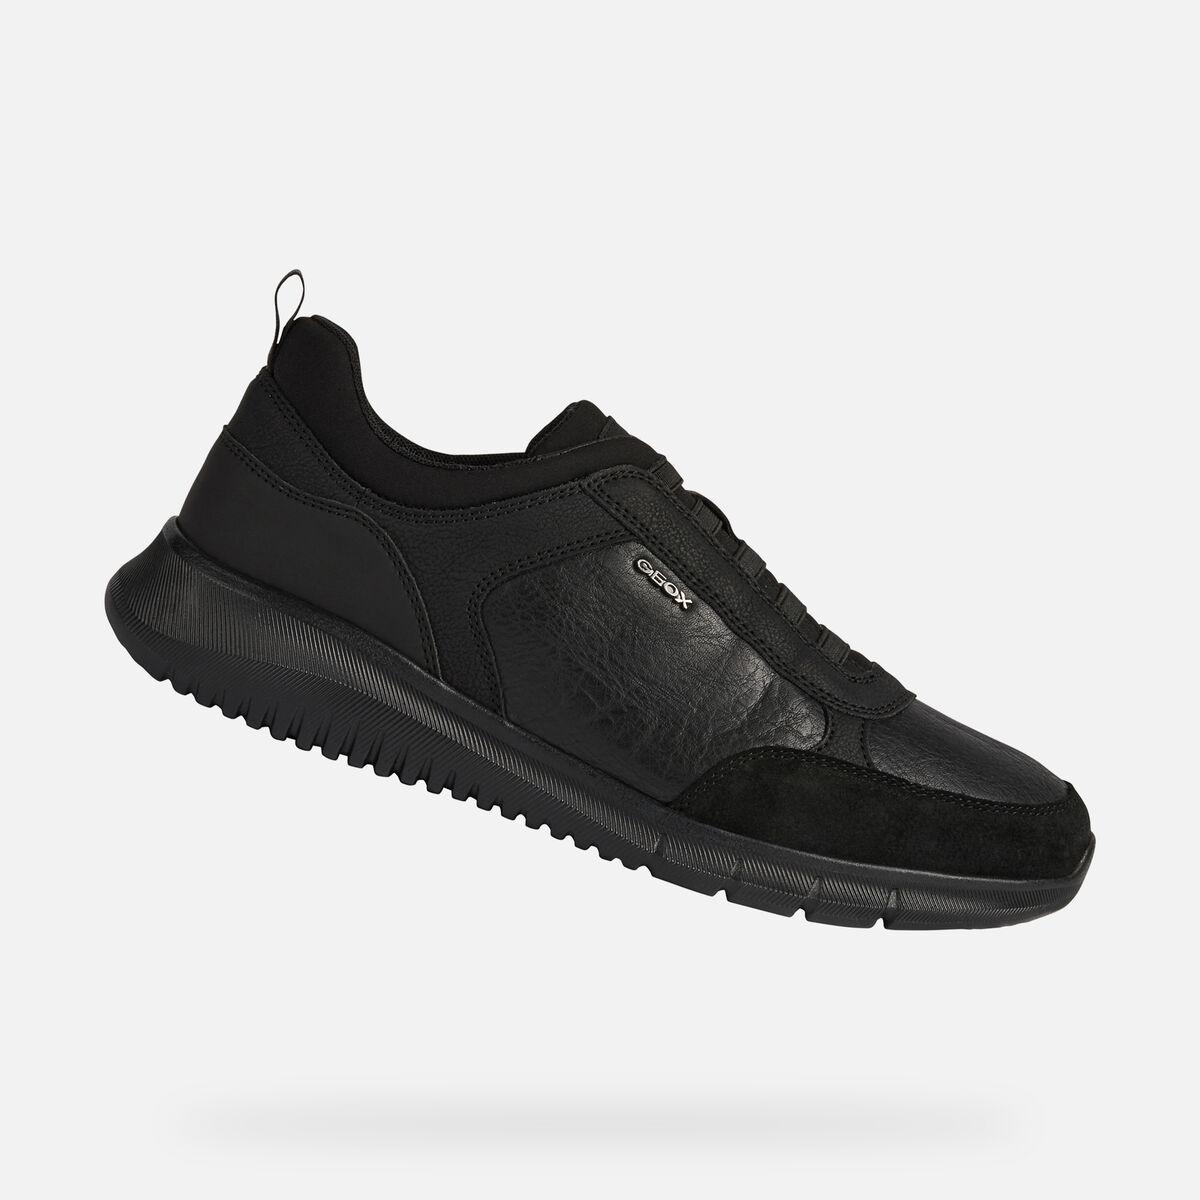 Geox sneakers black nero Monreale elastic